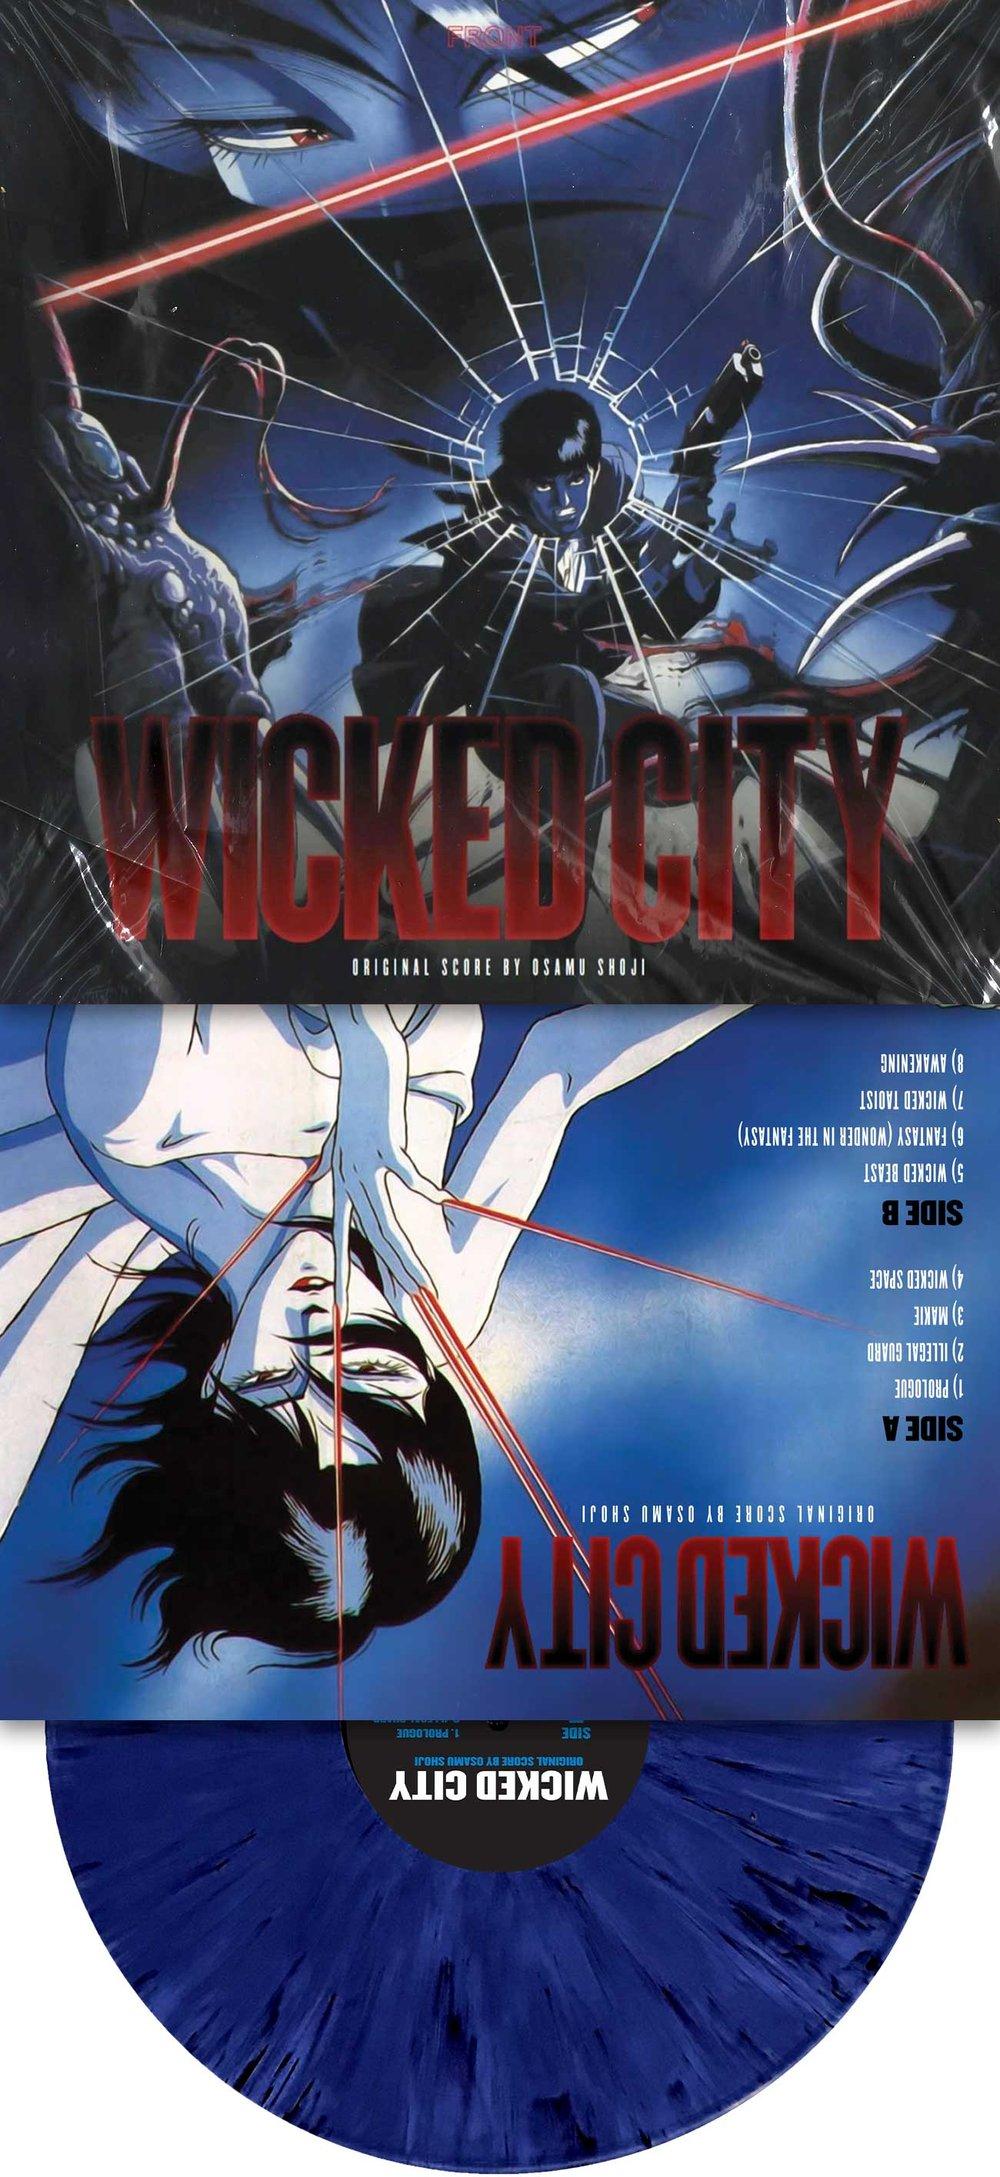 Wicked City Repress